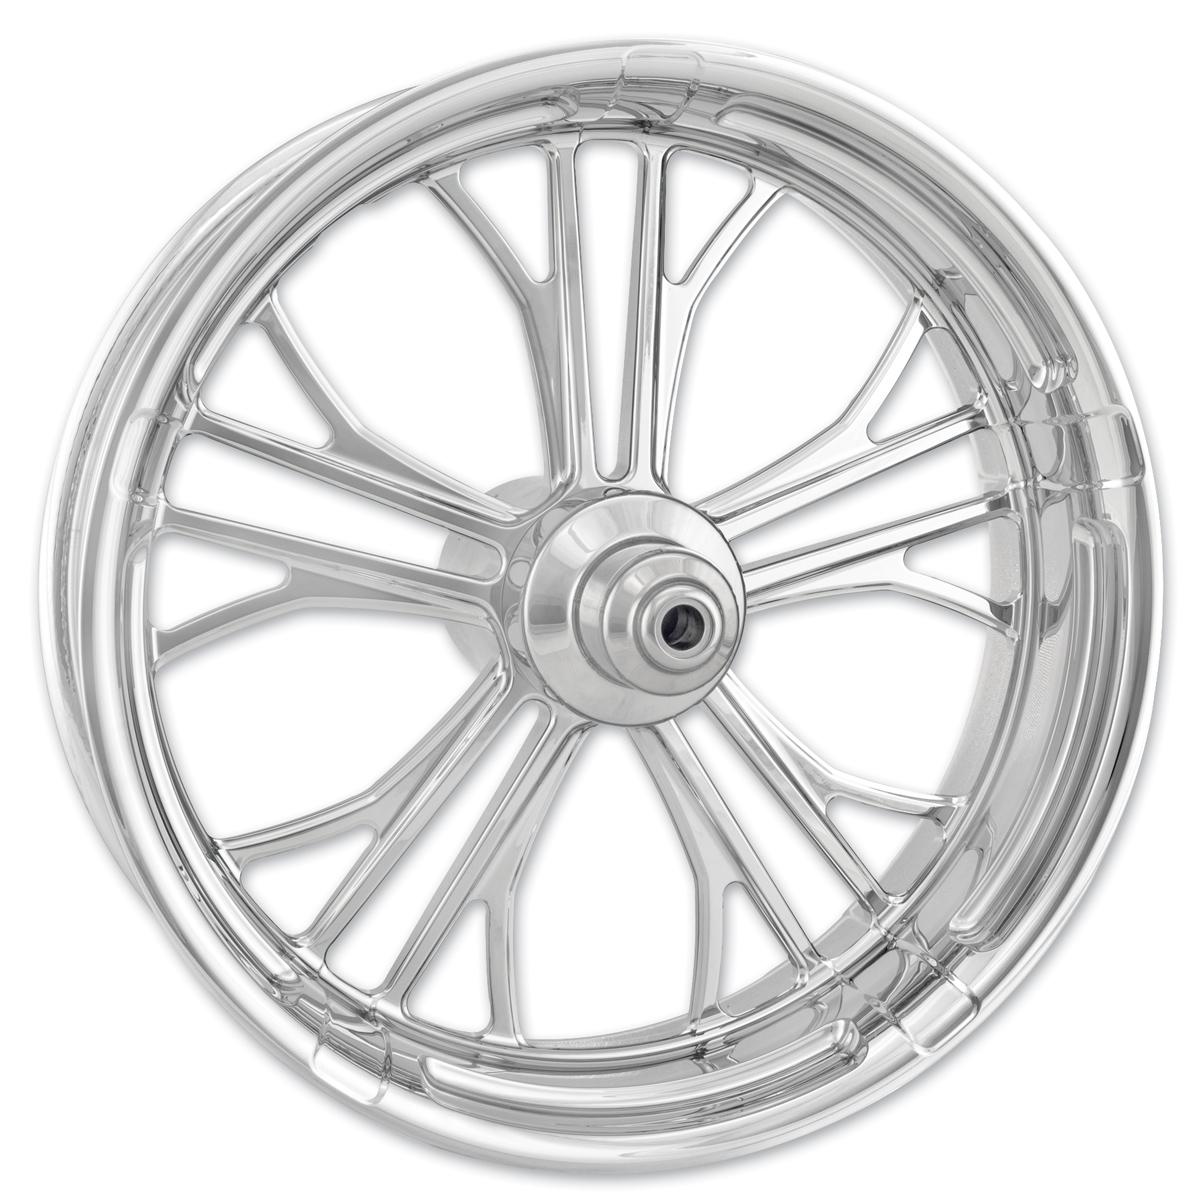 Performance Machine Dixon Chrome Rear Wheel 18x5.5